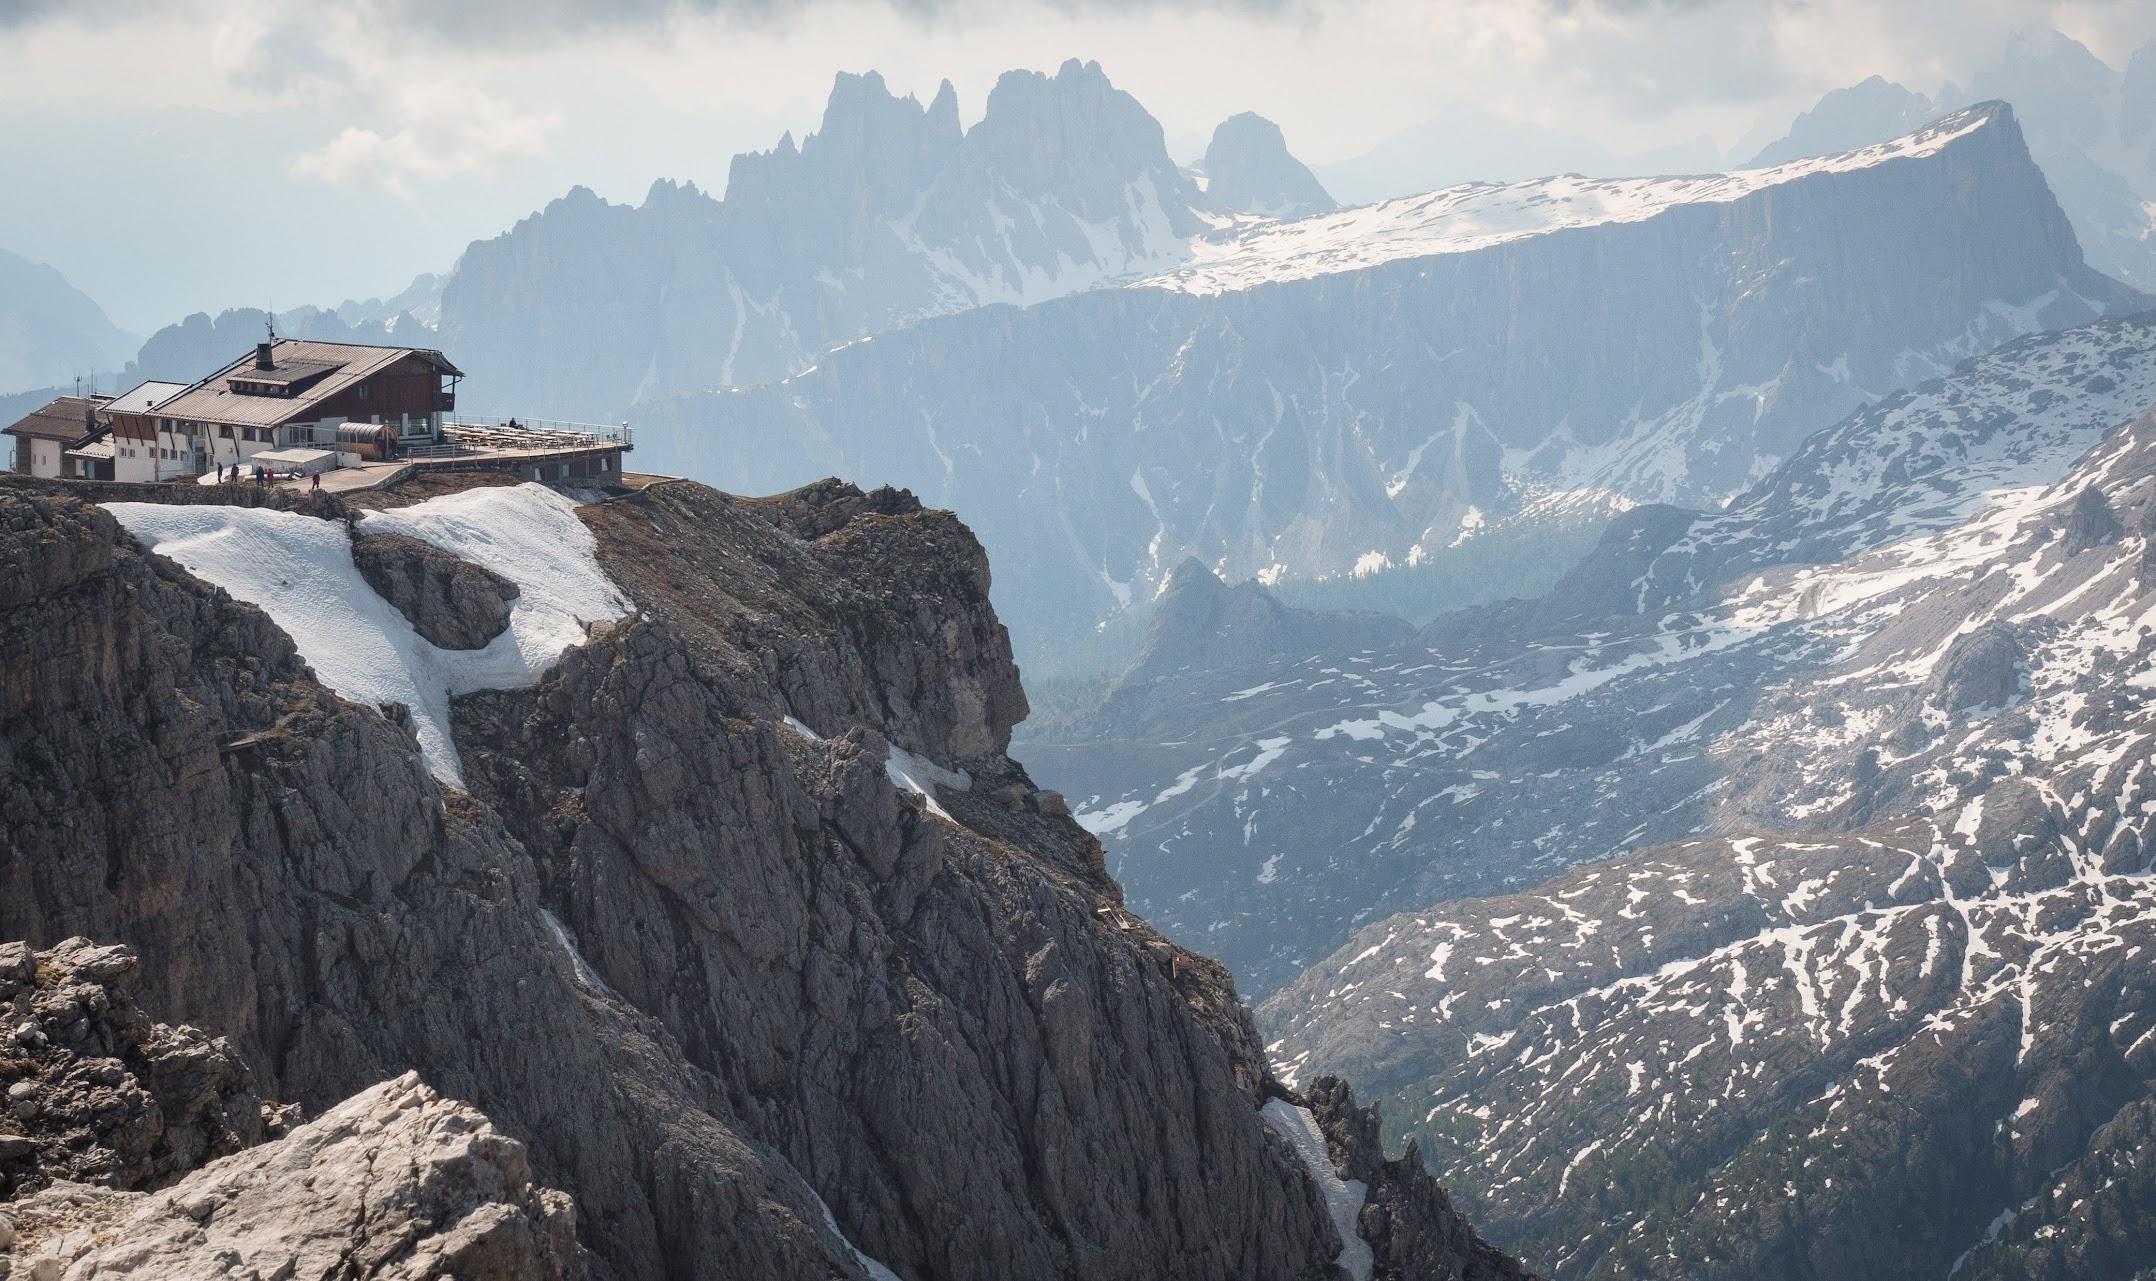 Rifugio Lagazuoi, the Dolomites